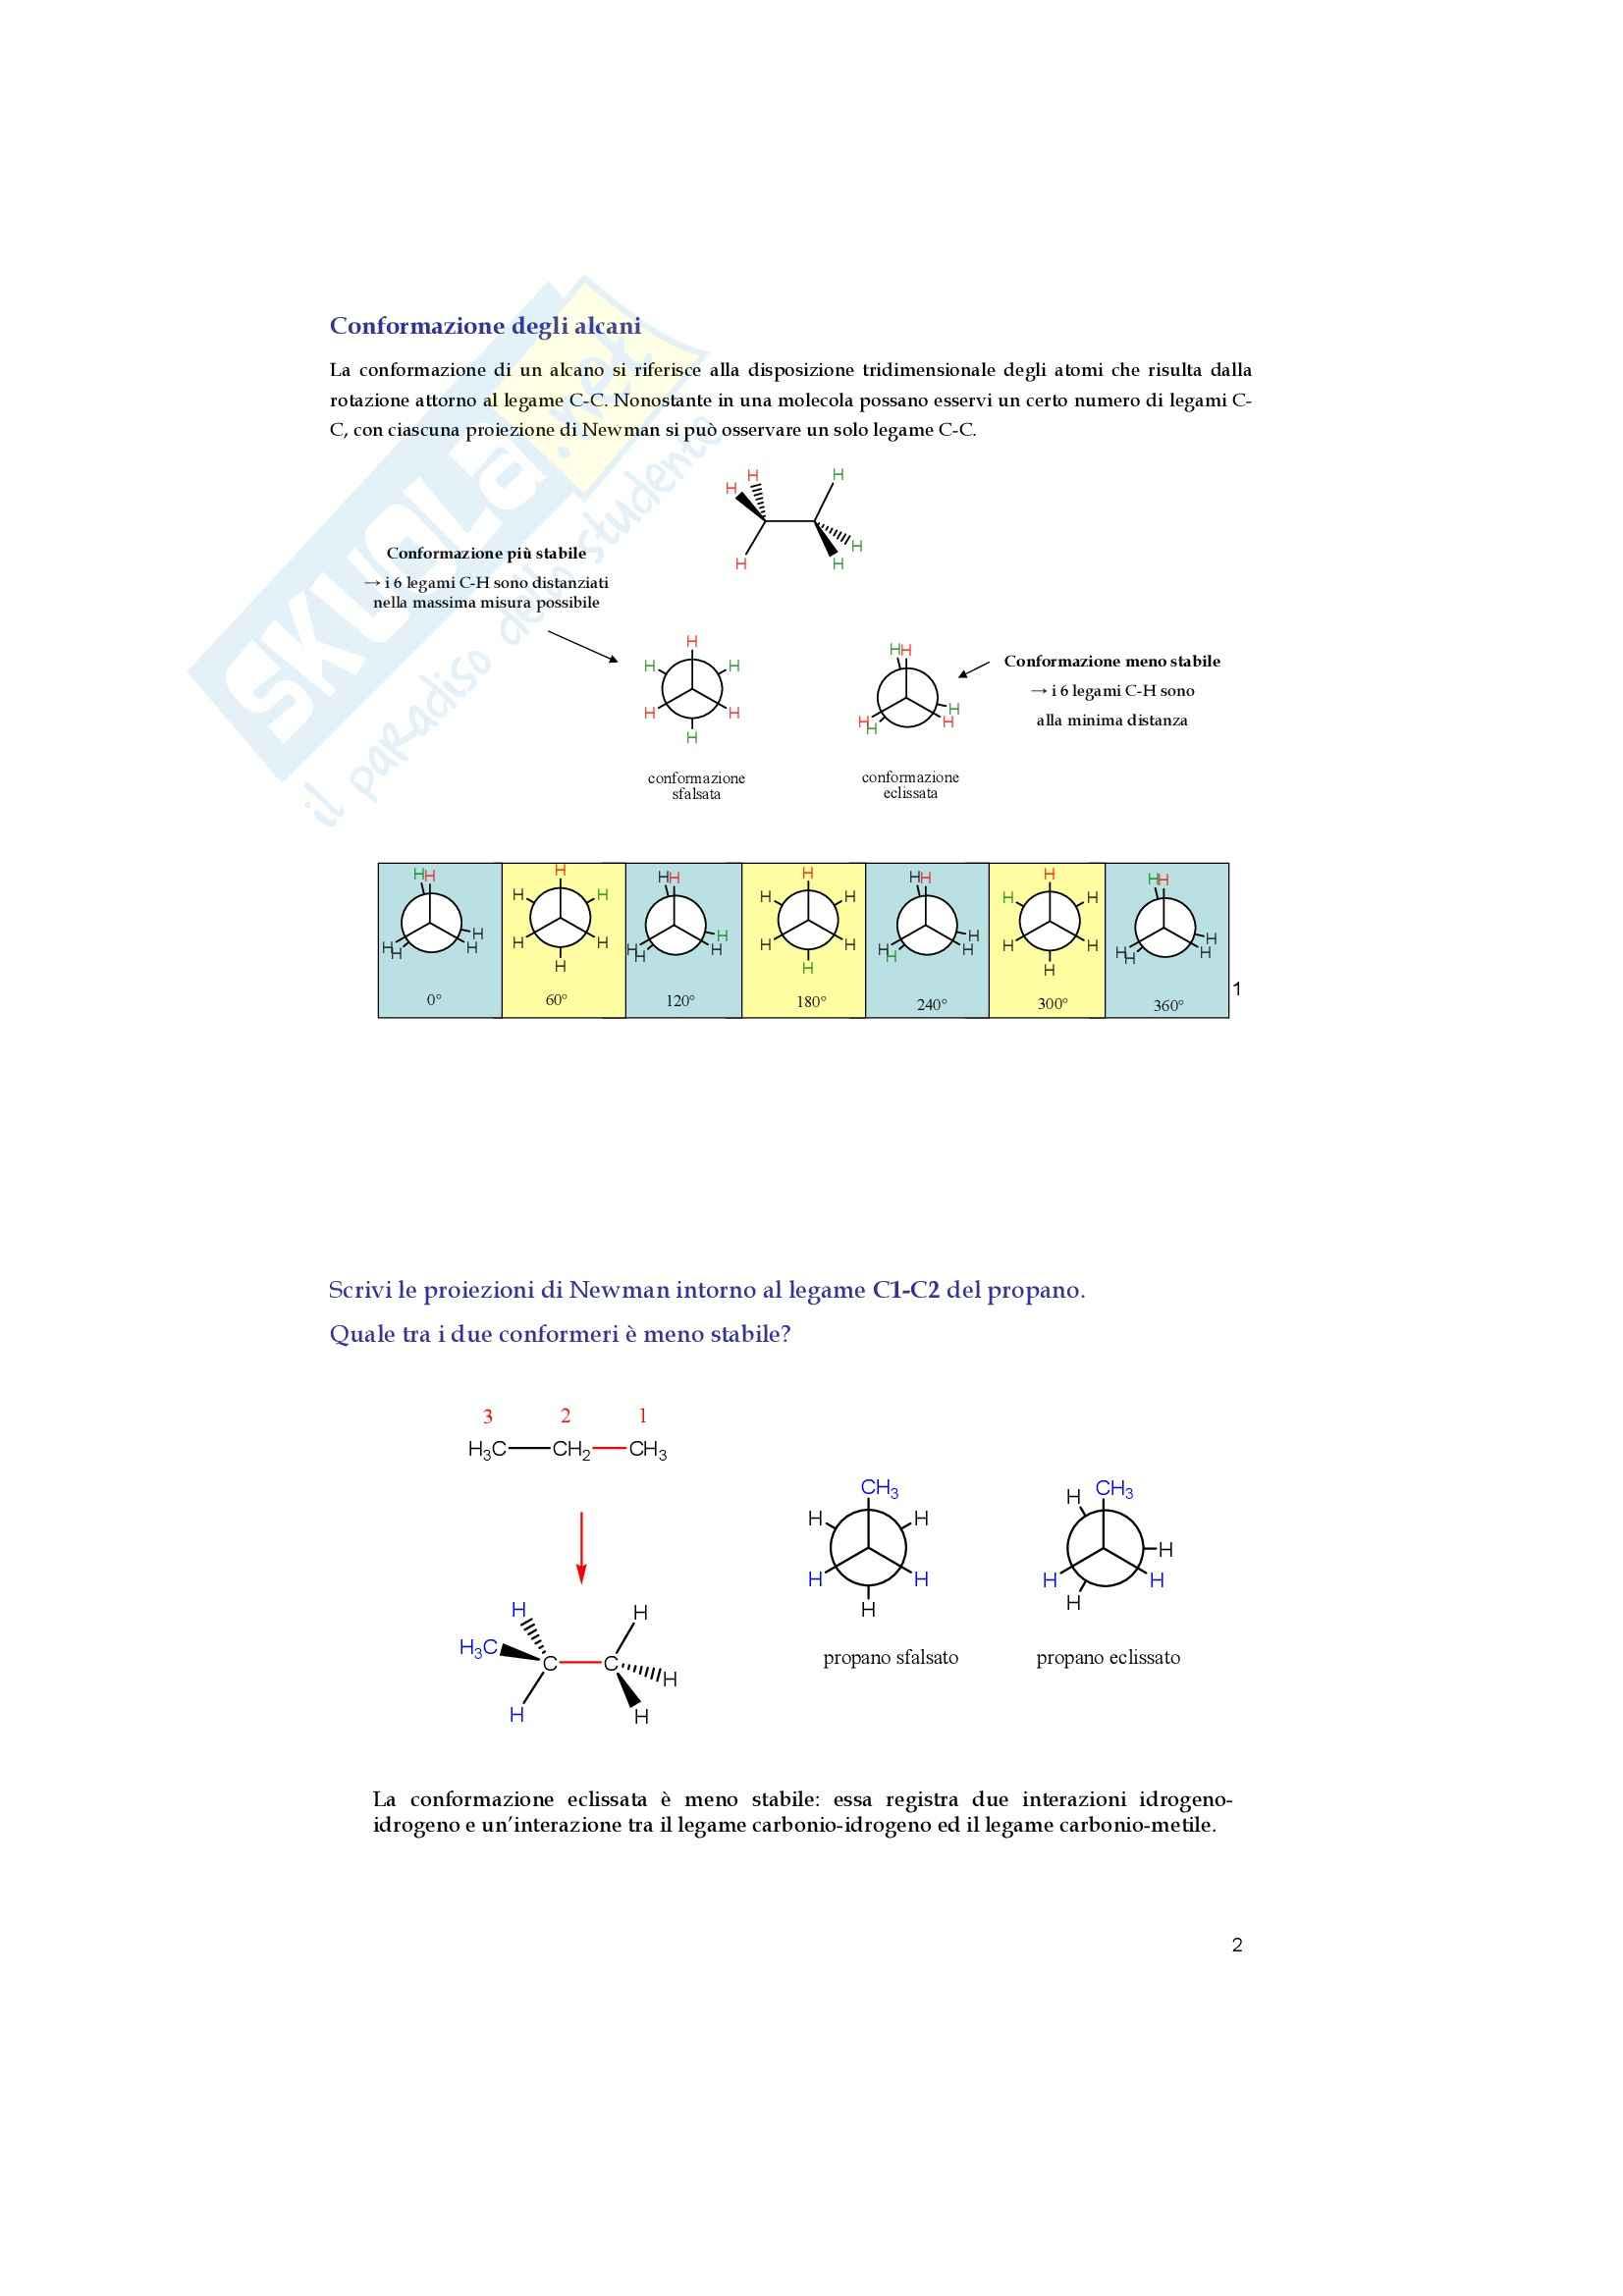 Chimica organica - alcani e cicloalcani